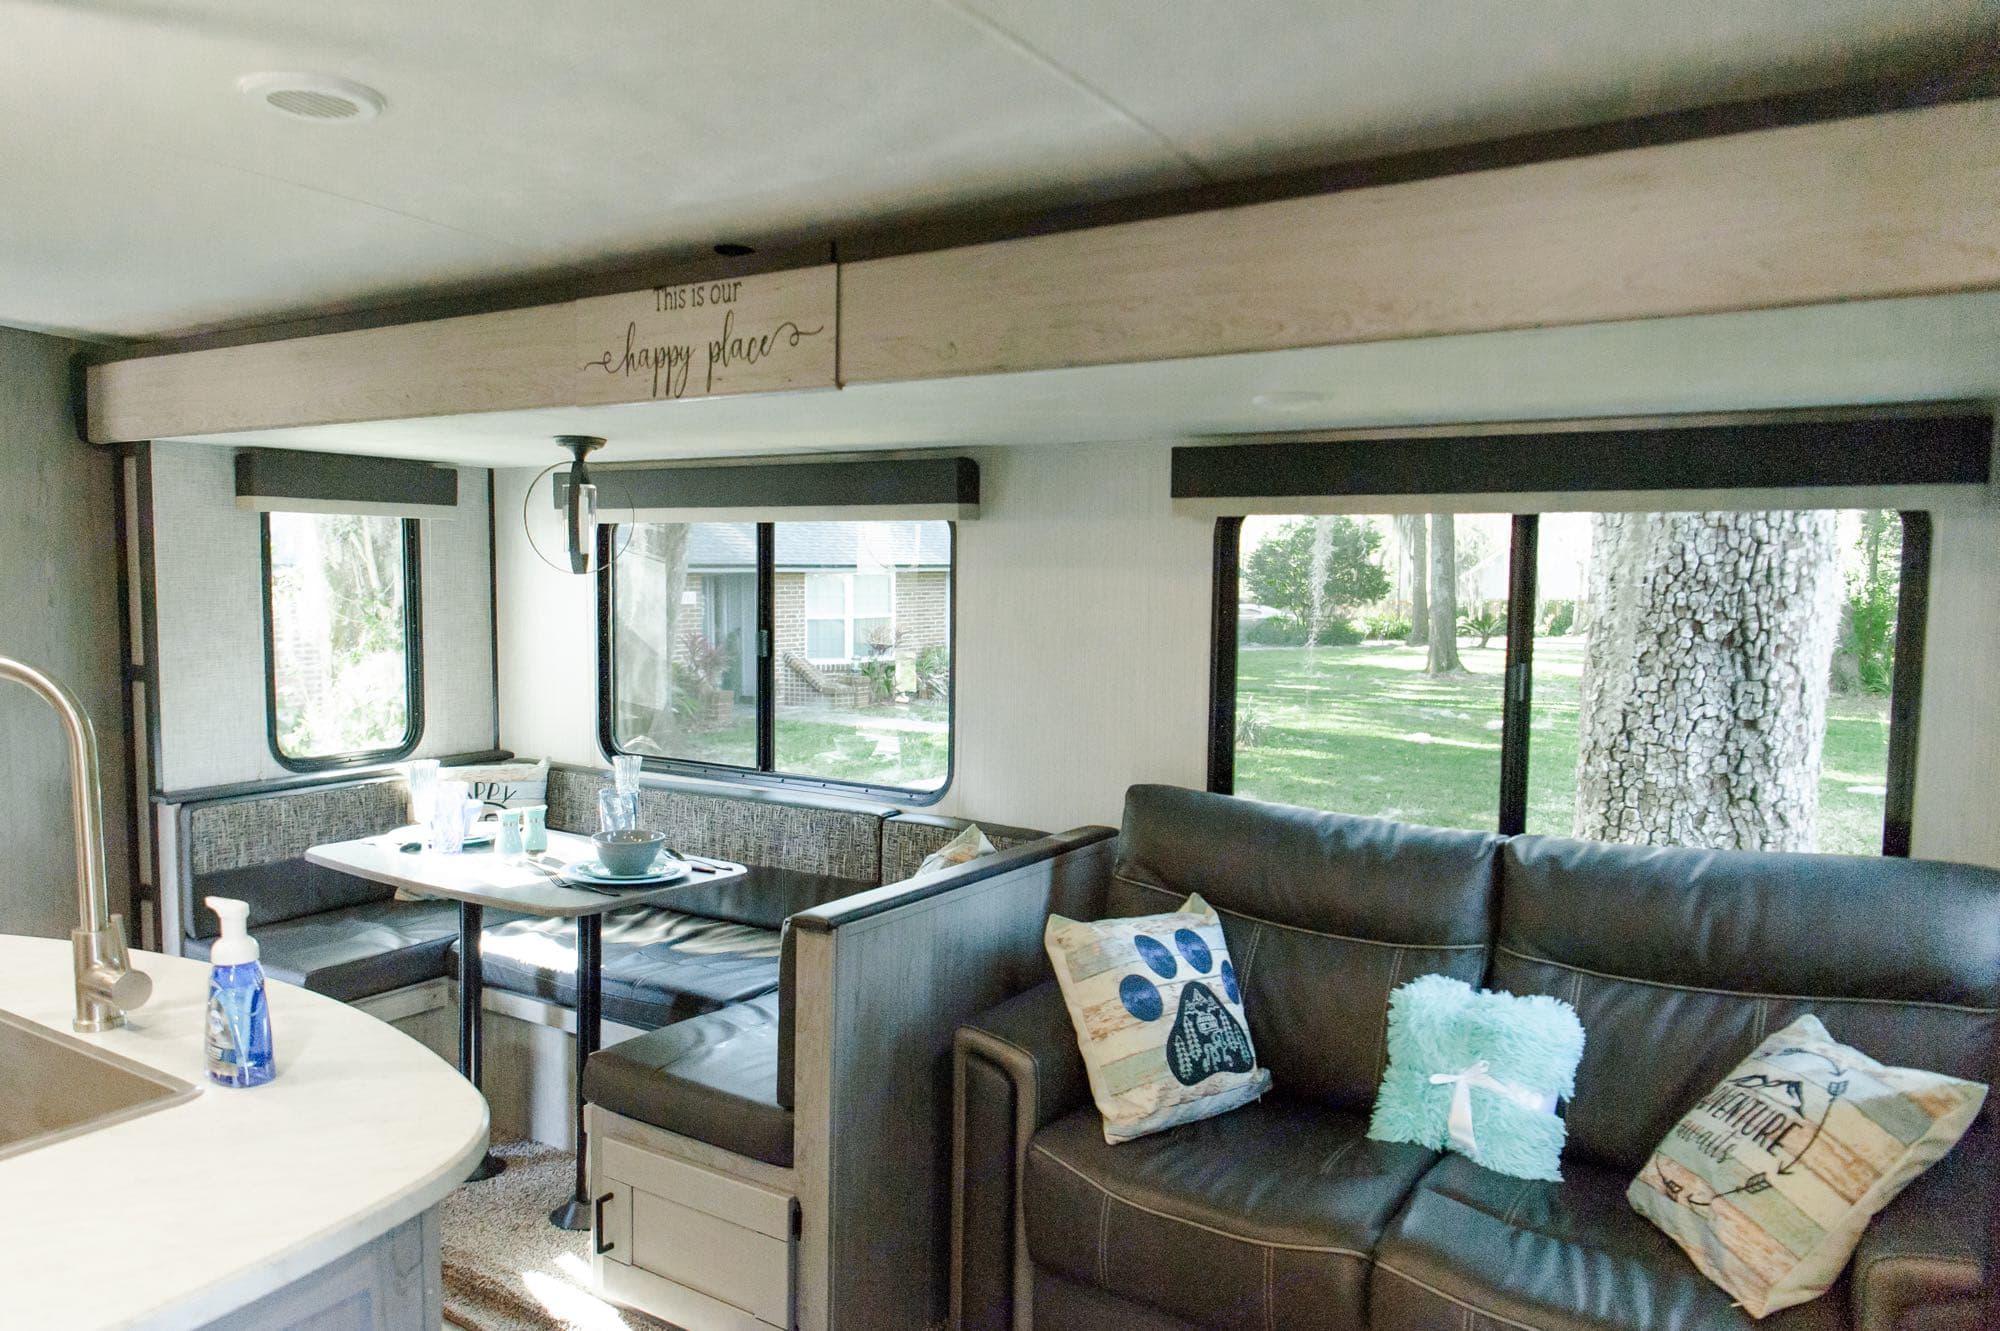 Dinette & couch both convert to beds. Heartland Mallard 2020